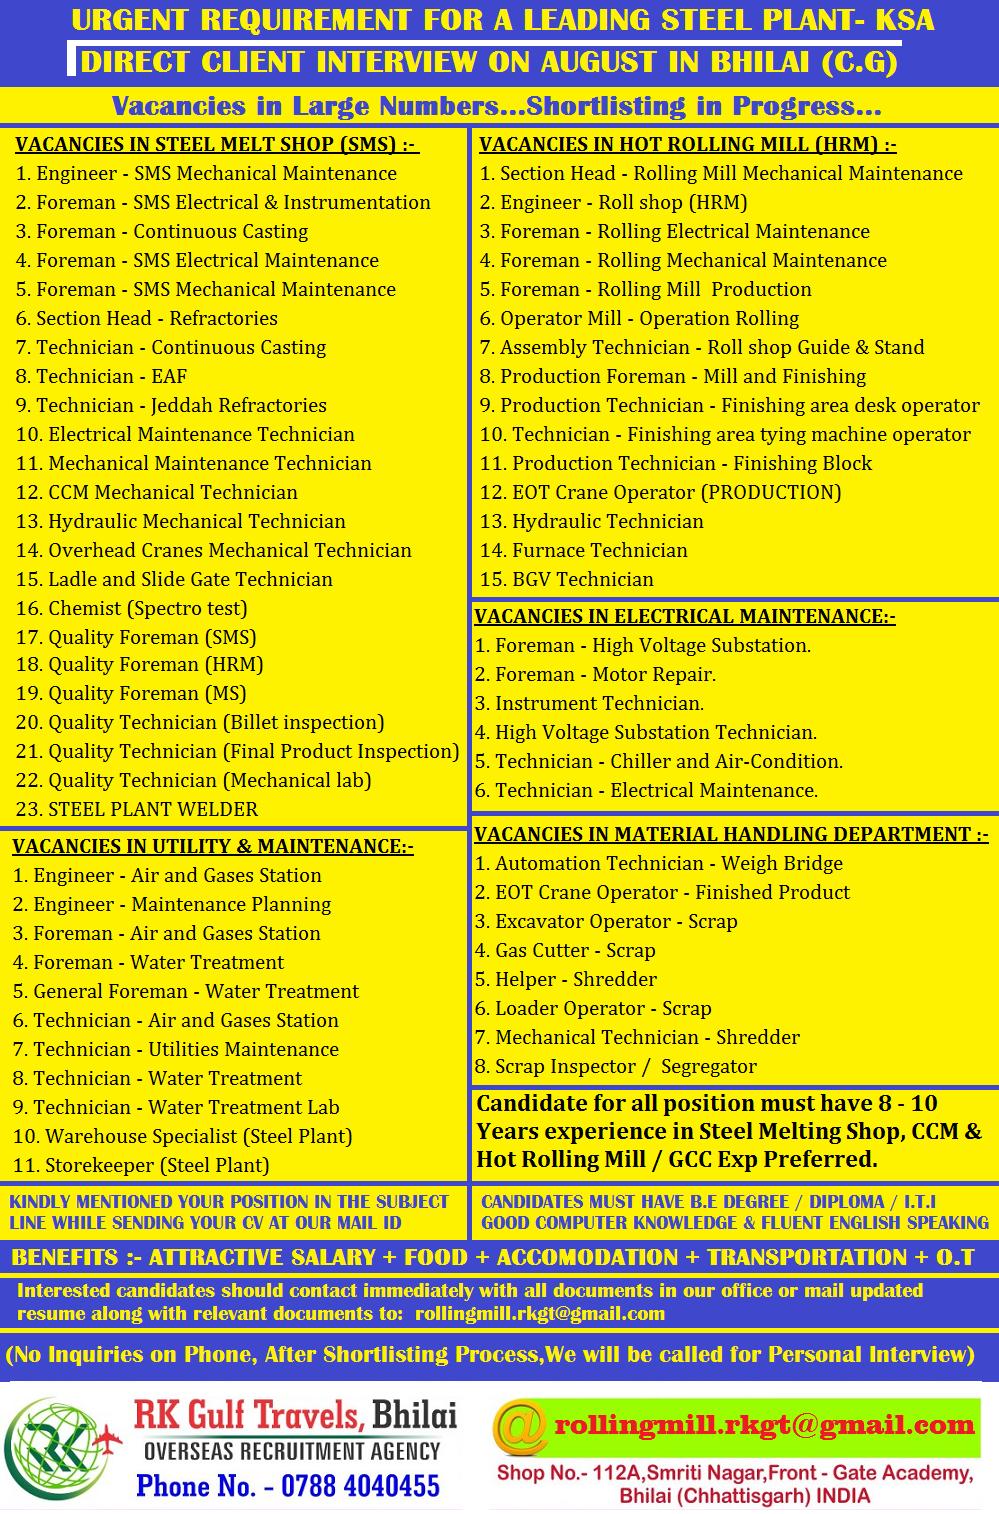 m.png Foreman Job In Kenya on jobs in guam, jobs in nyeri, jobs in paraguay, jobs in canada, jobs in kyrgyzstan, jobs in finland, jobs in cameroon, jobs in montenegro, jobs in lithuania, jobs in east african countries, jobs in grenada, jobs in liberia, jobs in the falkland islands, jobs in saint lucia, jobs in eritrea, jobs in sudan, jobs in honduras, jobs in botswana, jobs in congo, jobs in nigeria,